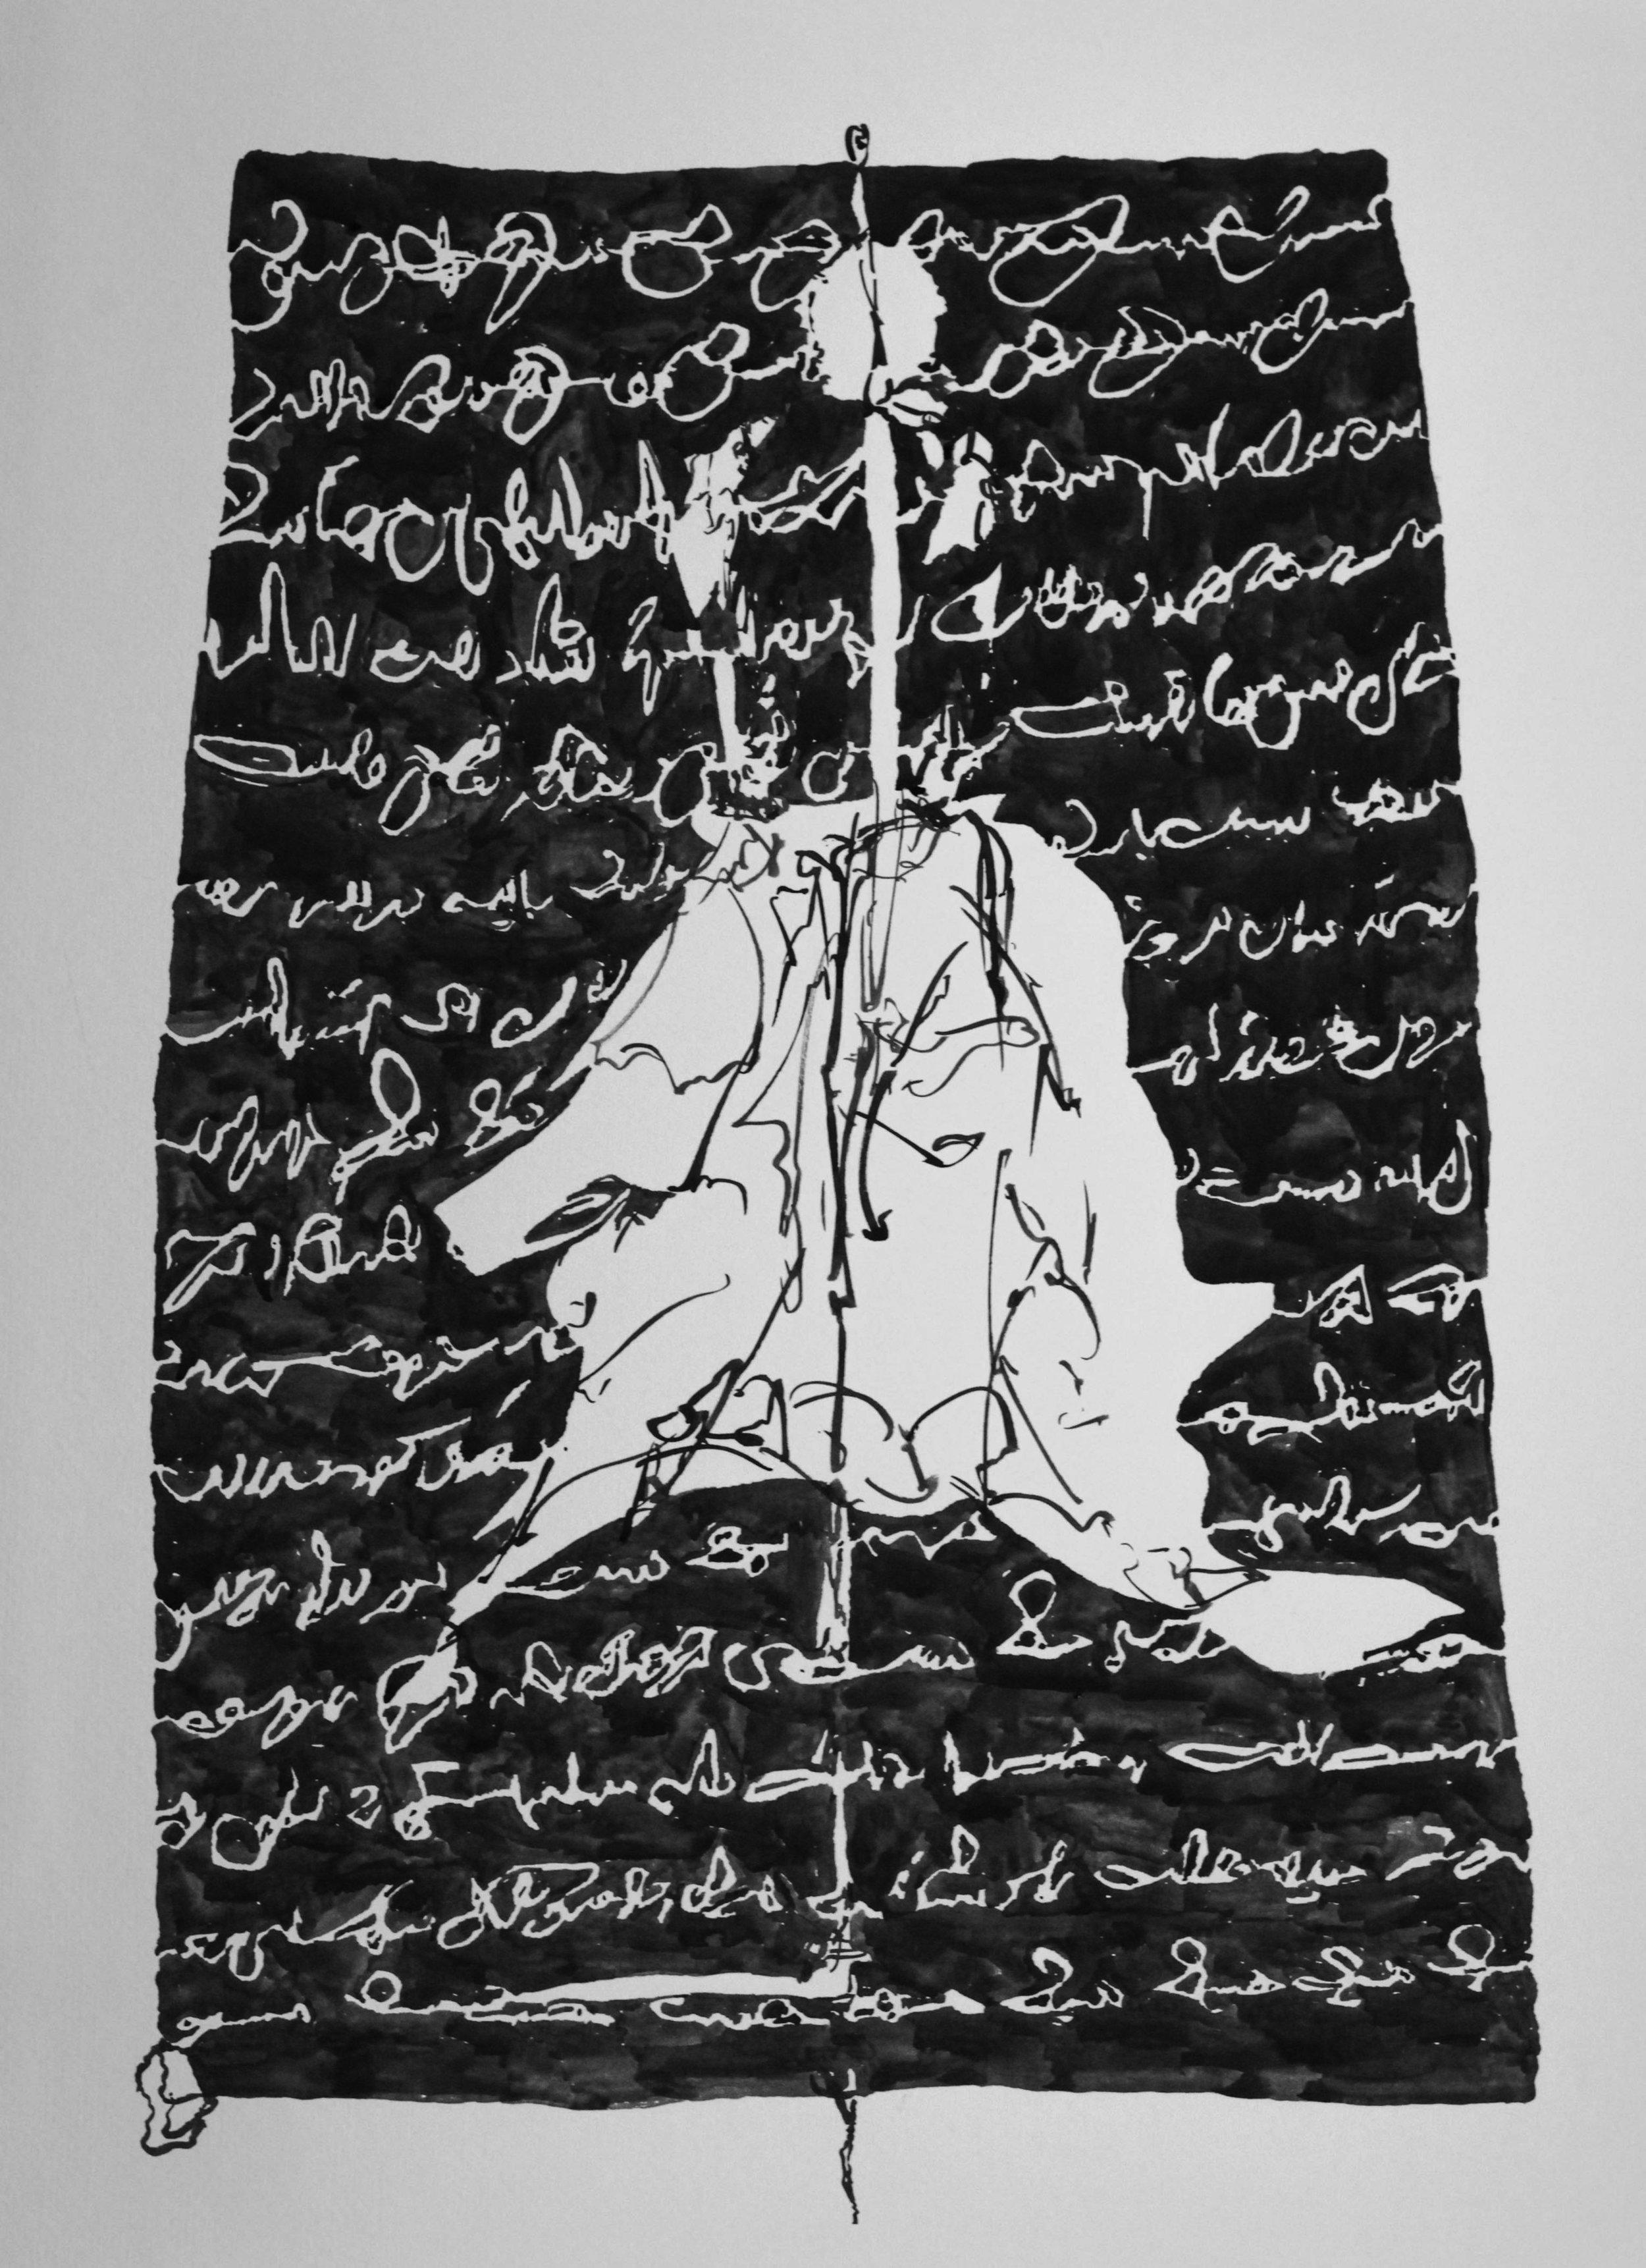 Farzad Kohan - Untitled - 24x18 - 2016